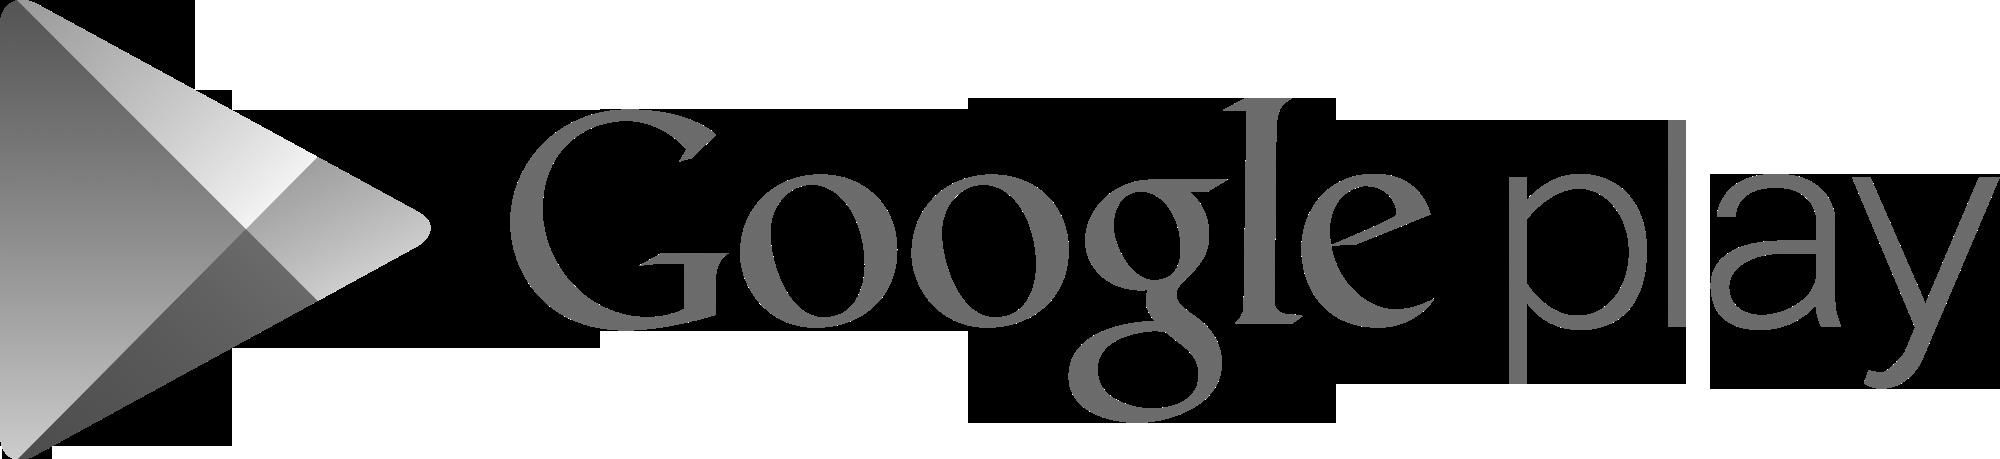 Google-Play-logo-wordmark.png